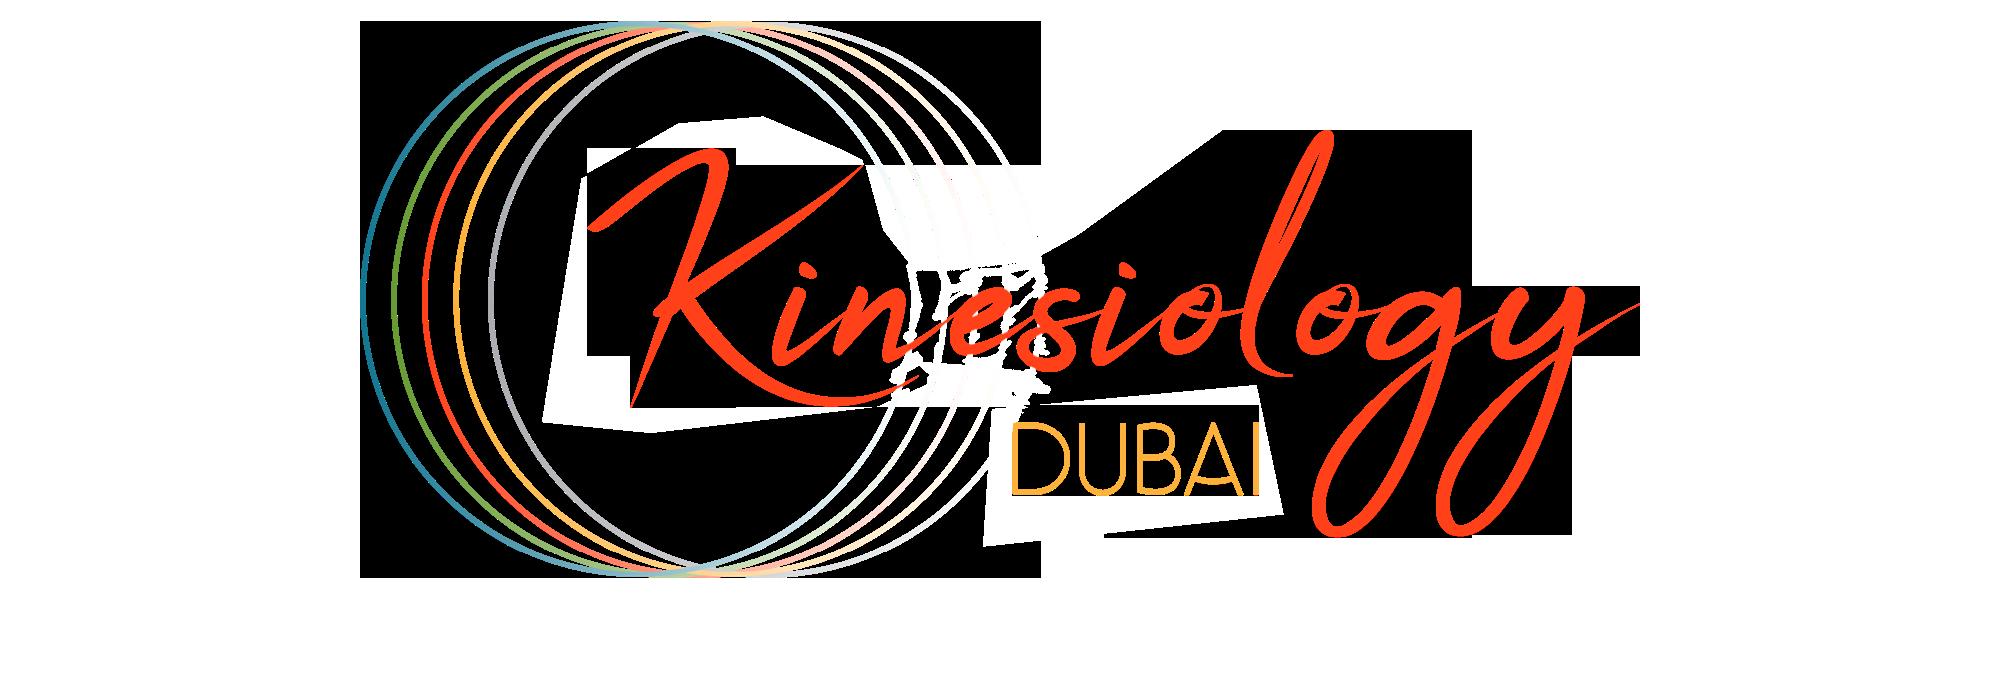 KinDub-Logo-2000w-700h.png